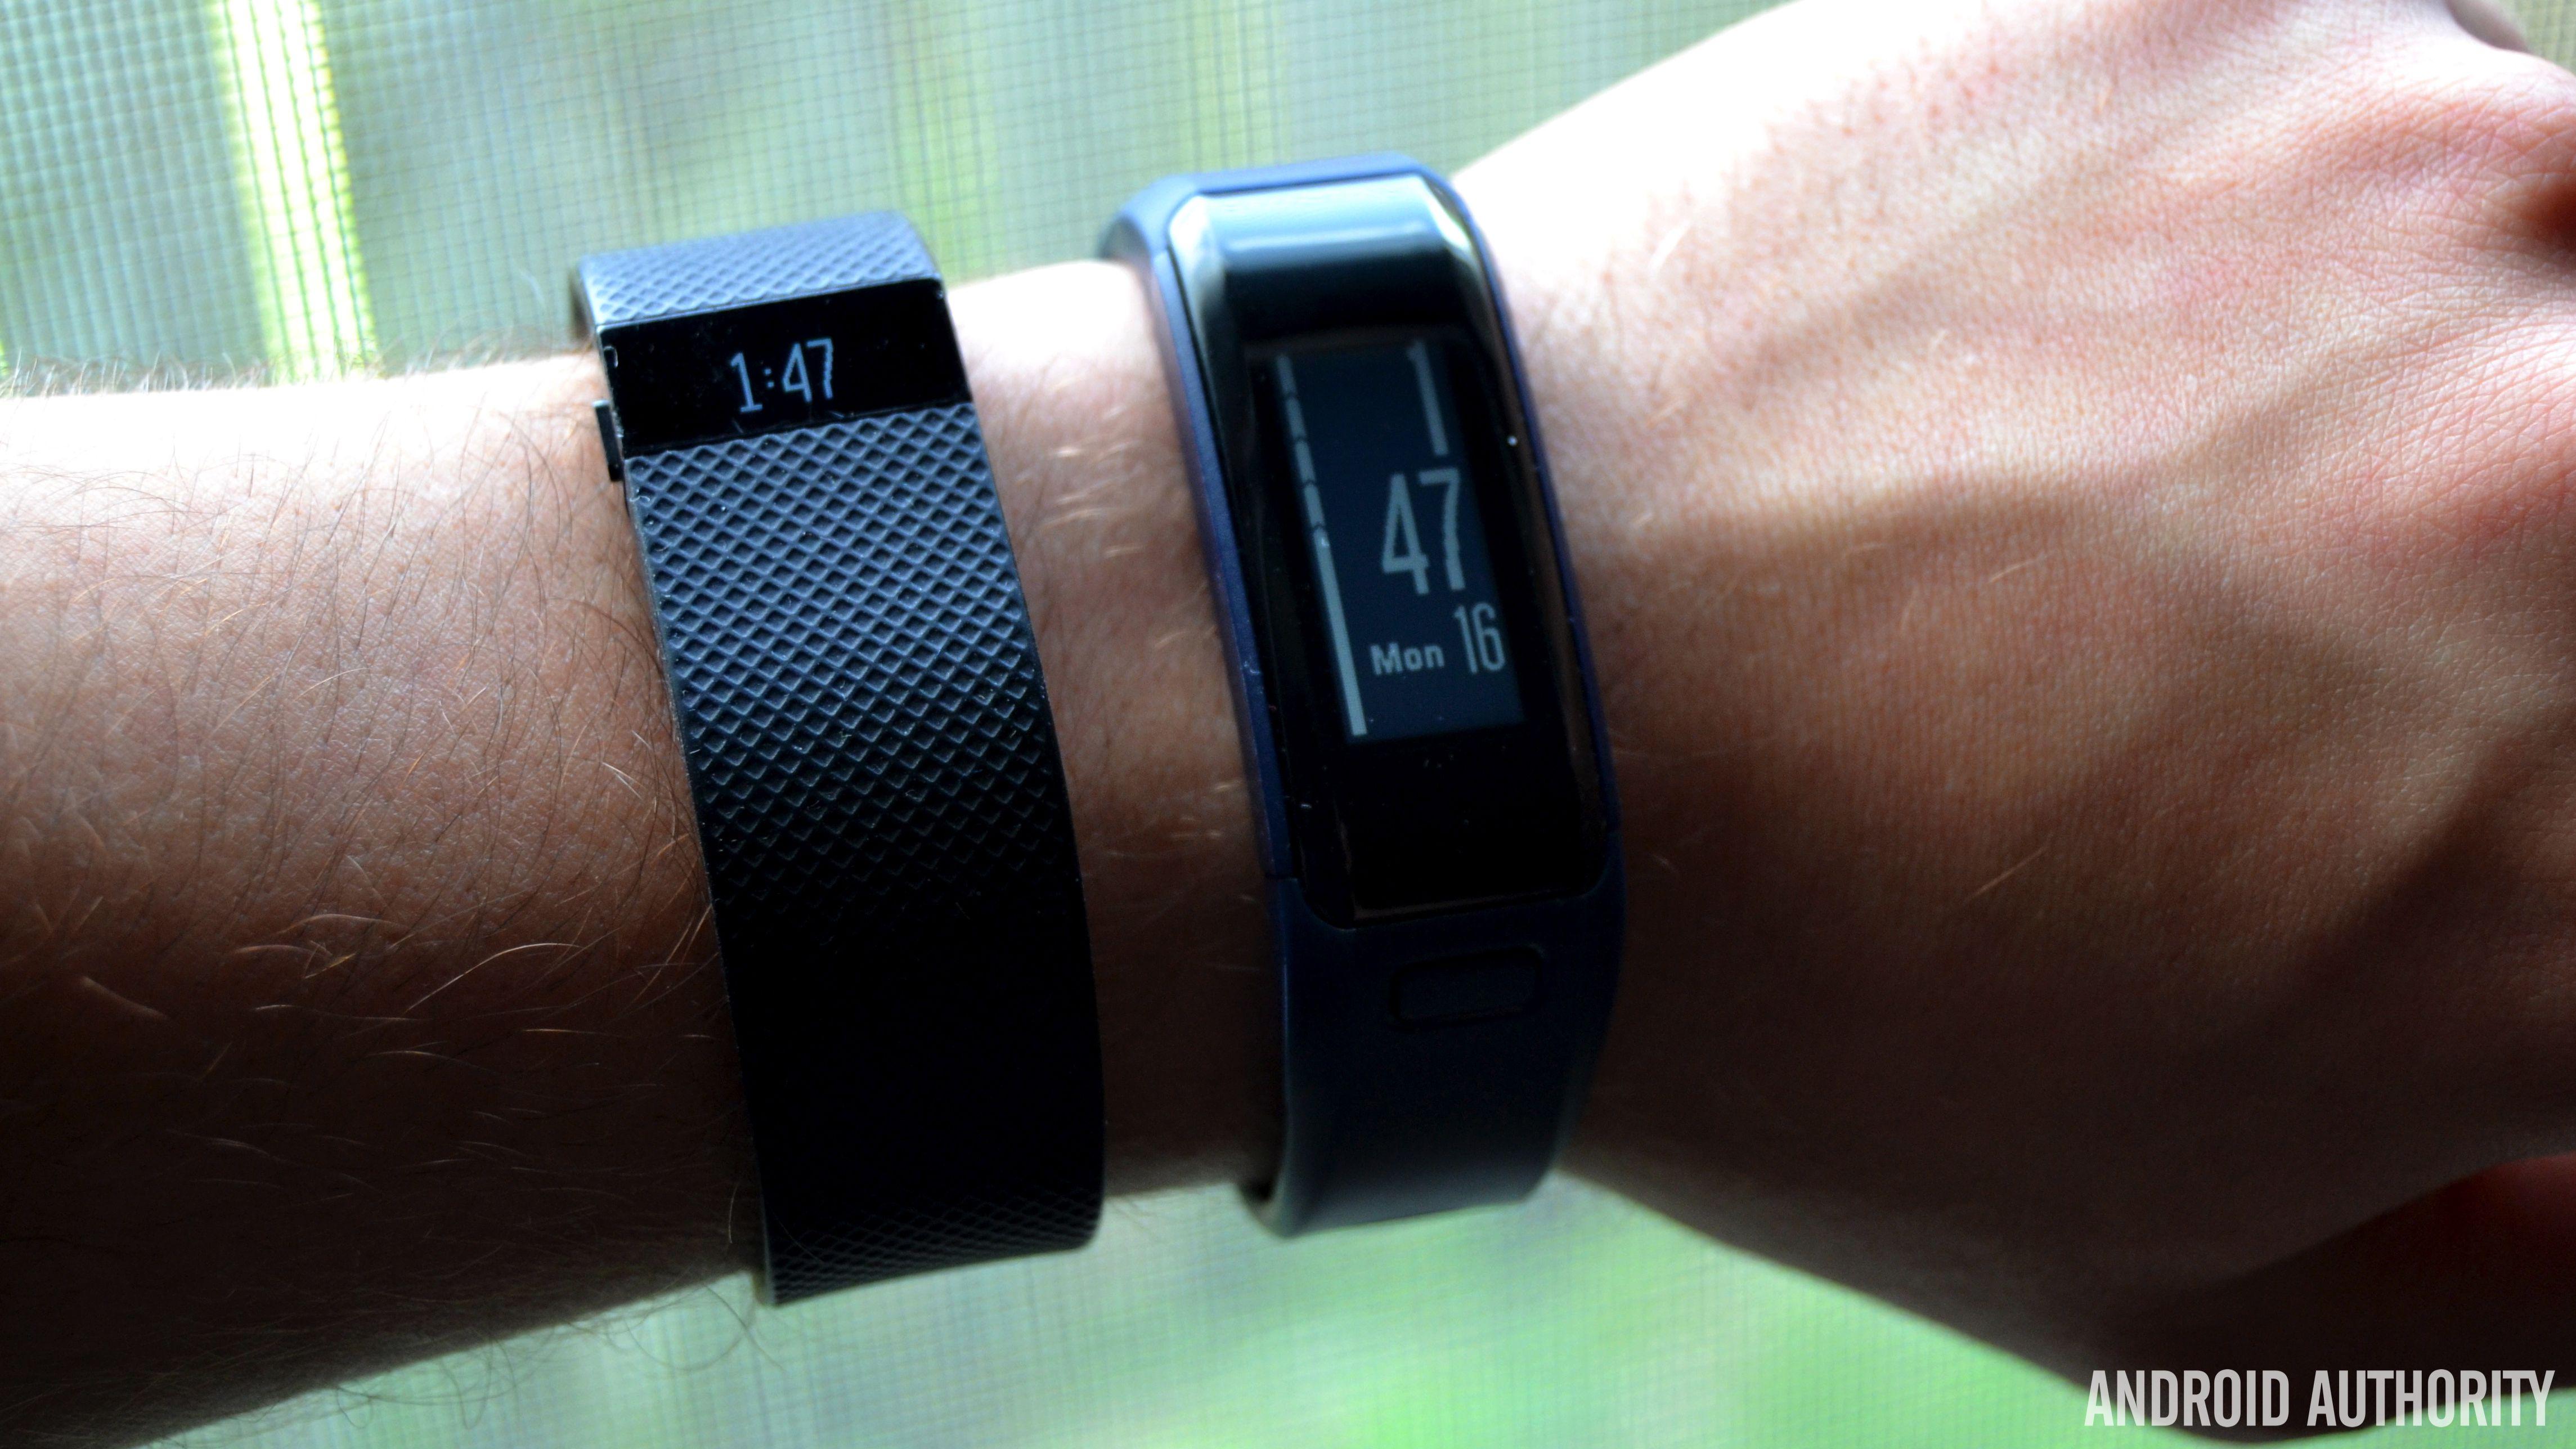 Fitbit Charge Hr Vs Garmin Vivosmart Hr Fitbit Fitness Tracker Fitness Watch Tracker Garmin Fitness Tracker